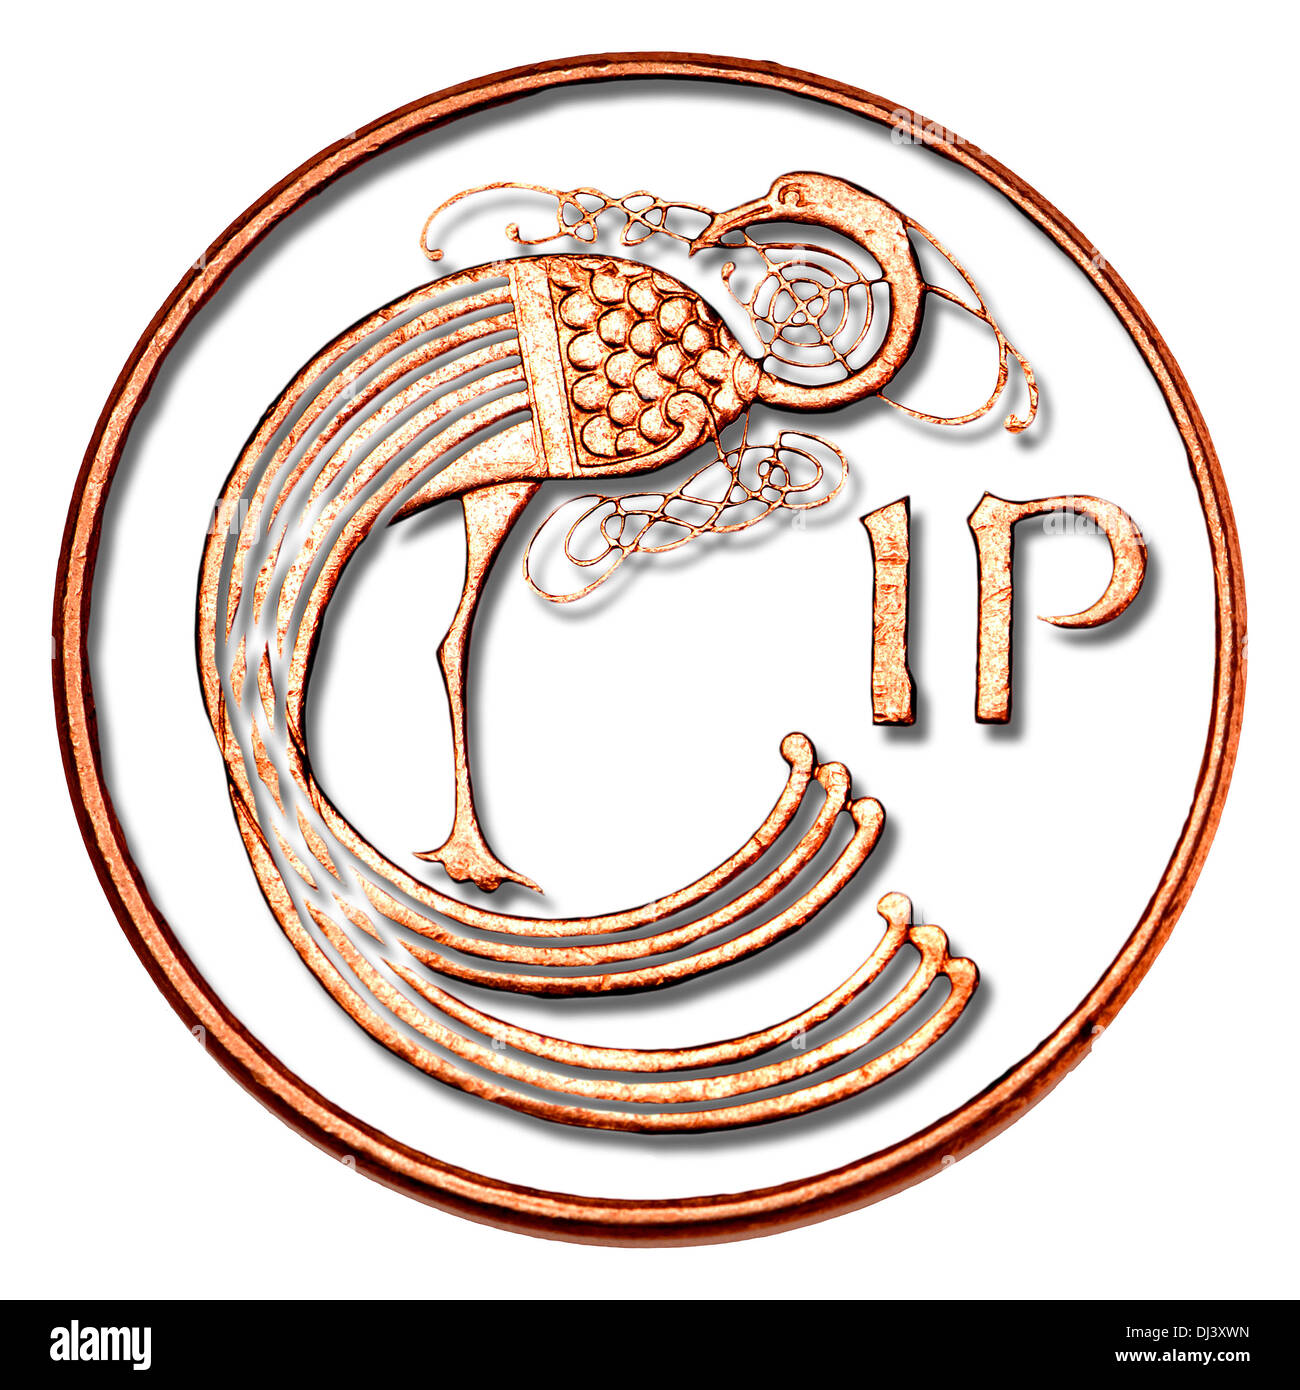 Irish Penny - Celtic bird design - Stock Image